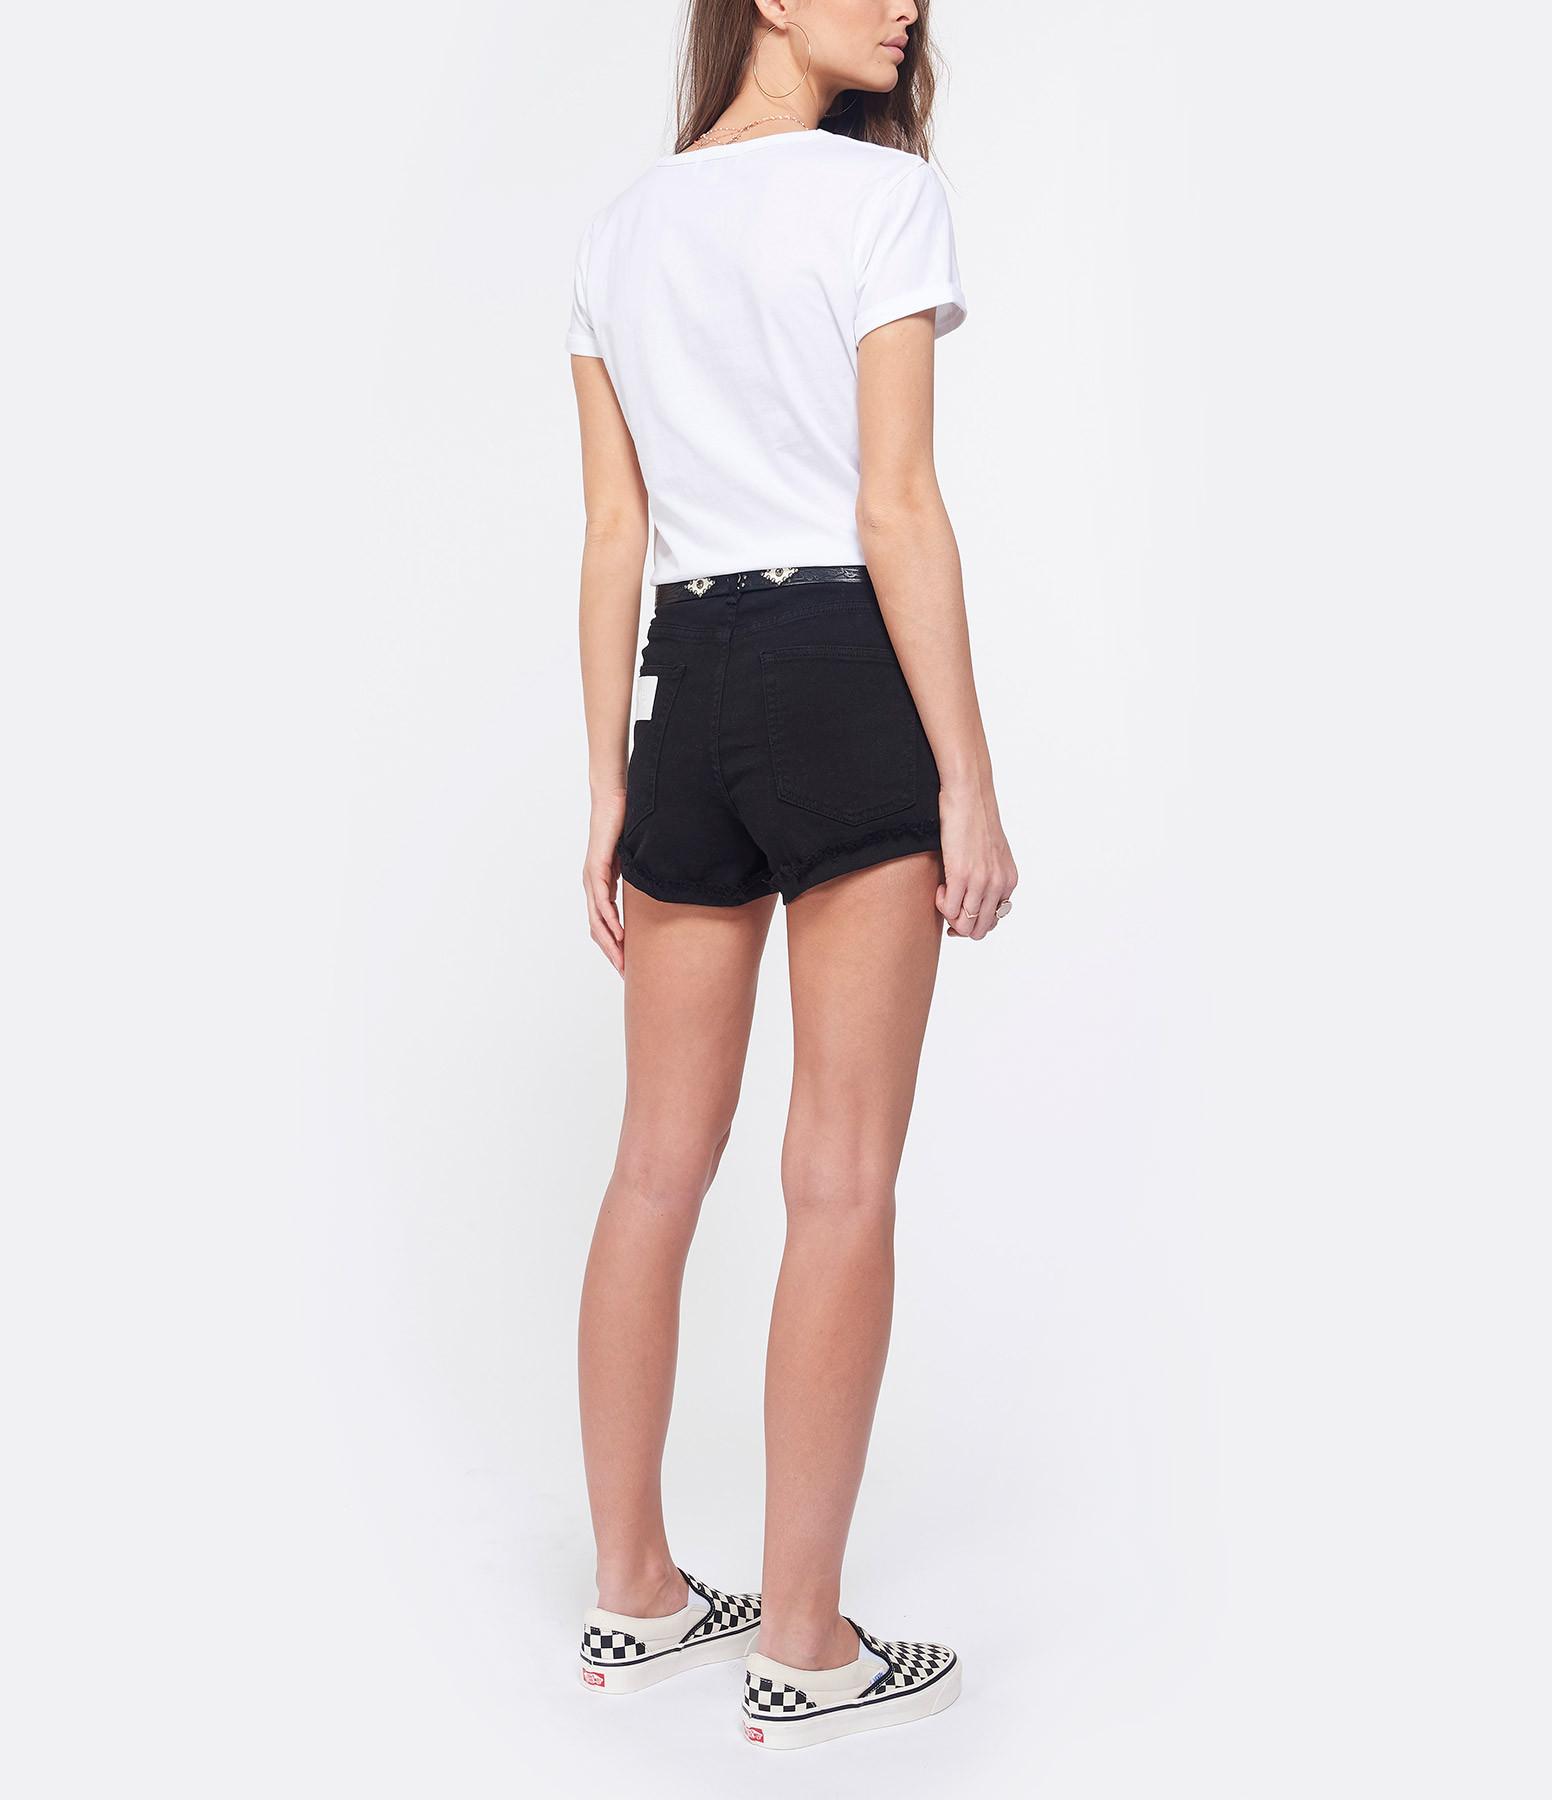 MAISON LABICHE - Tee-shirt Exclusivité Lulli in Love Blanc Rouge